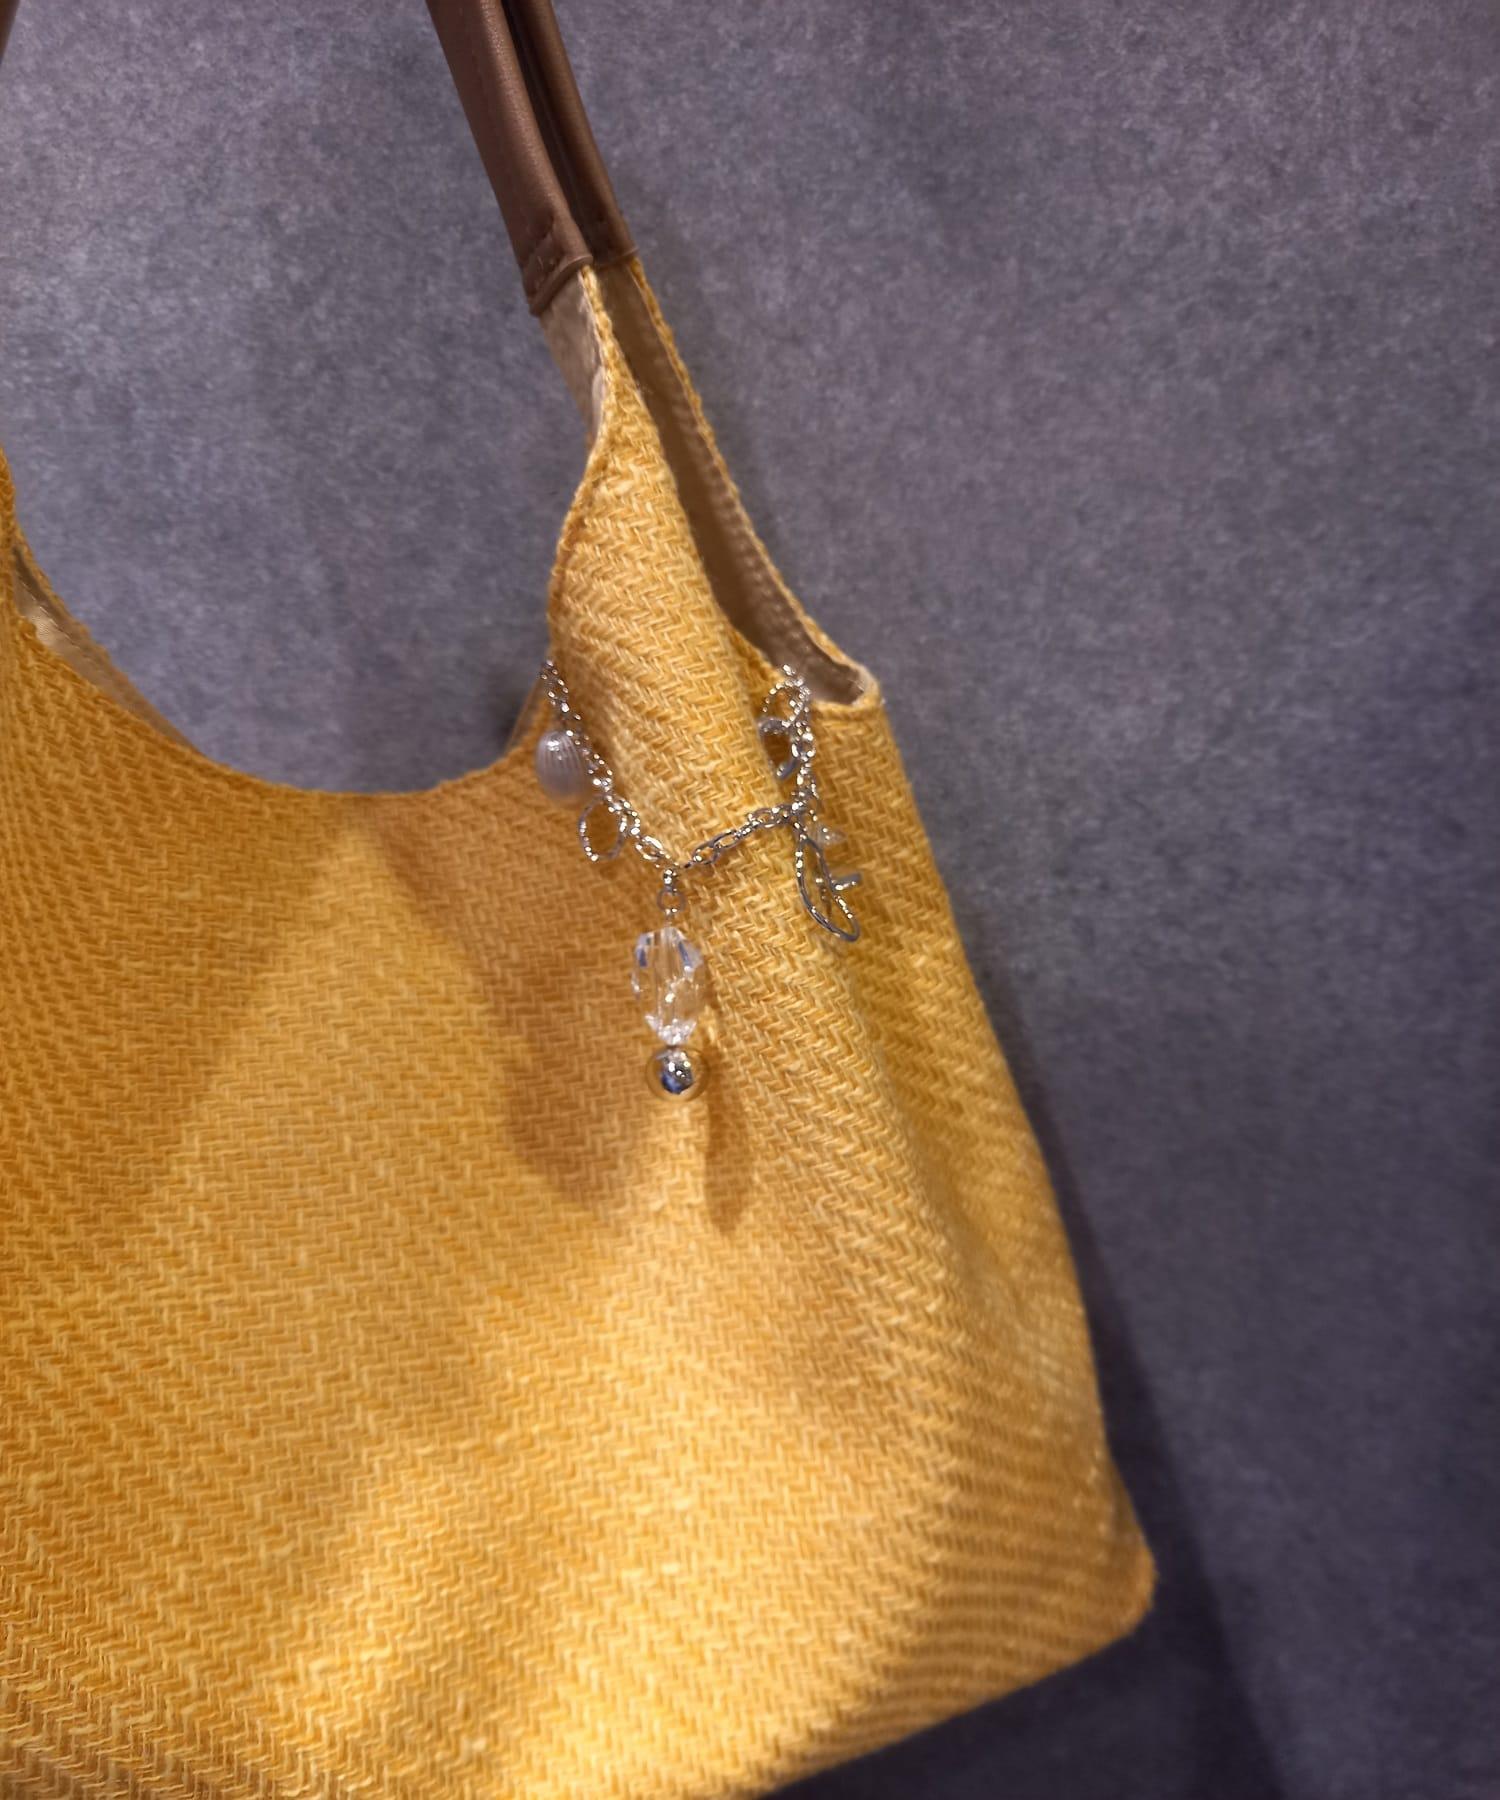 Pal collection(パルコレクション) 《Bag Charm》メタルラインチャーム